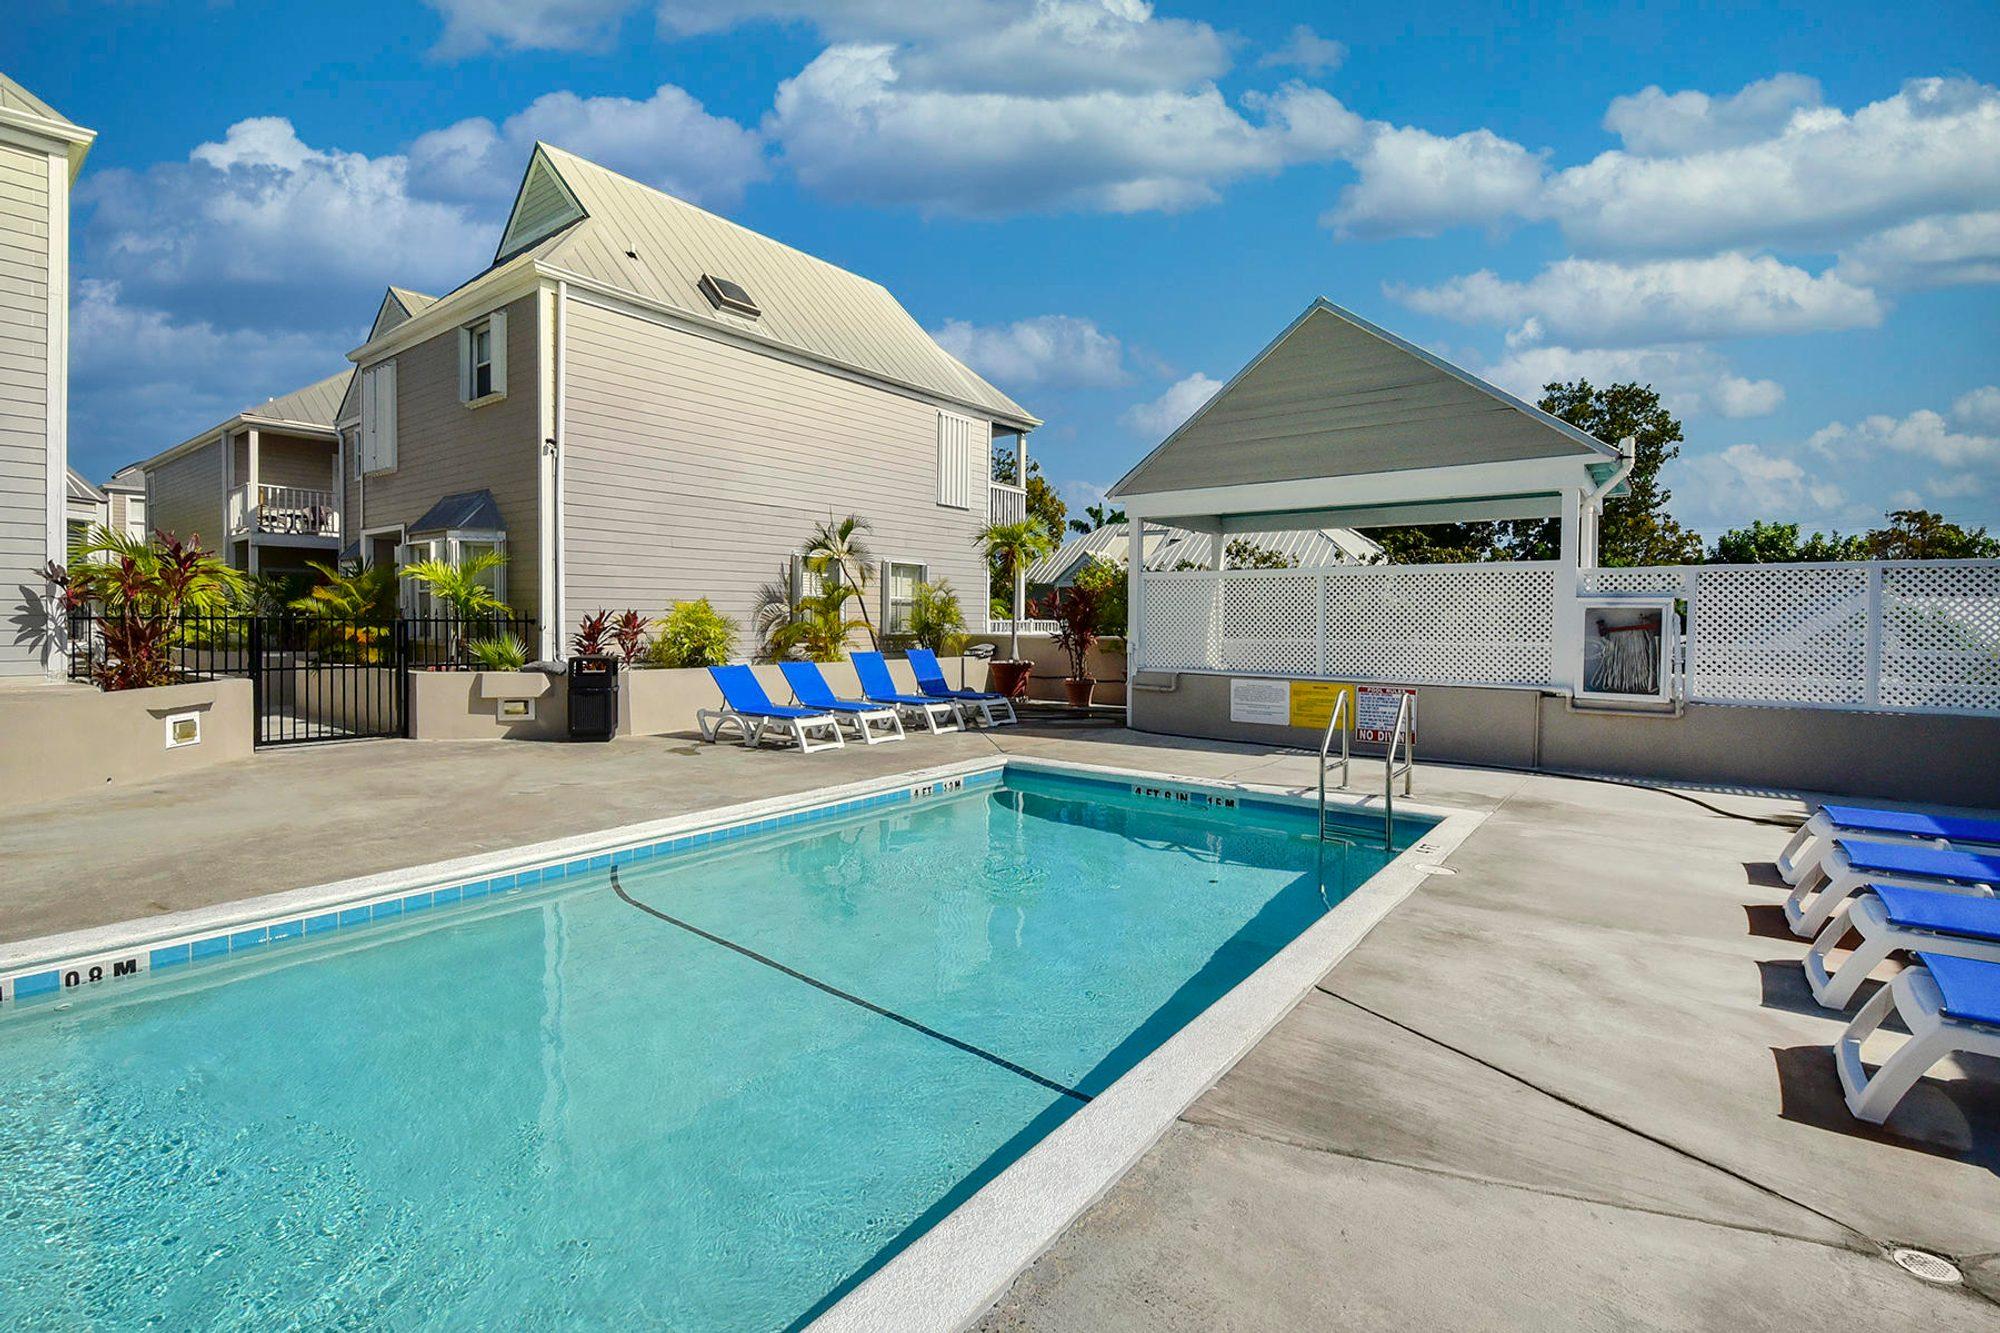 Condo in Key West, Florida, United States 1